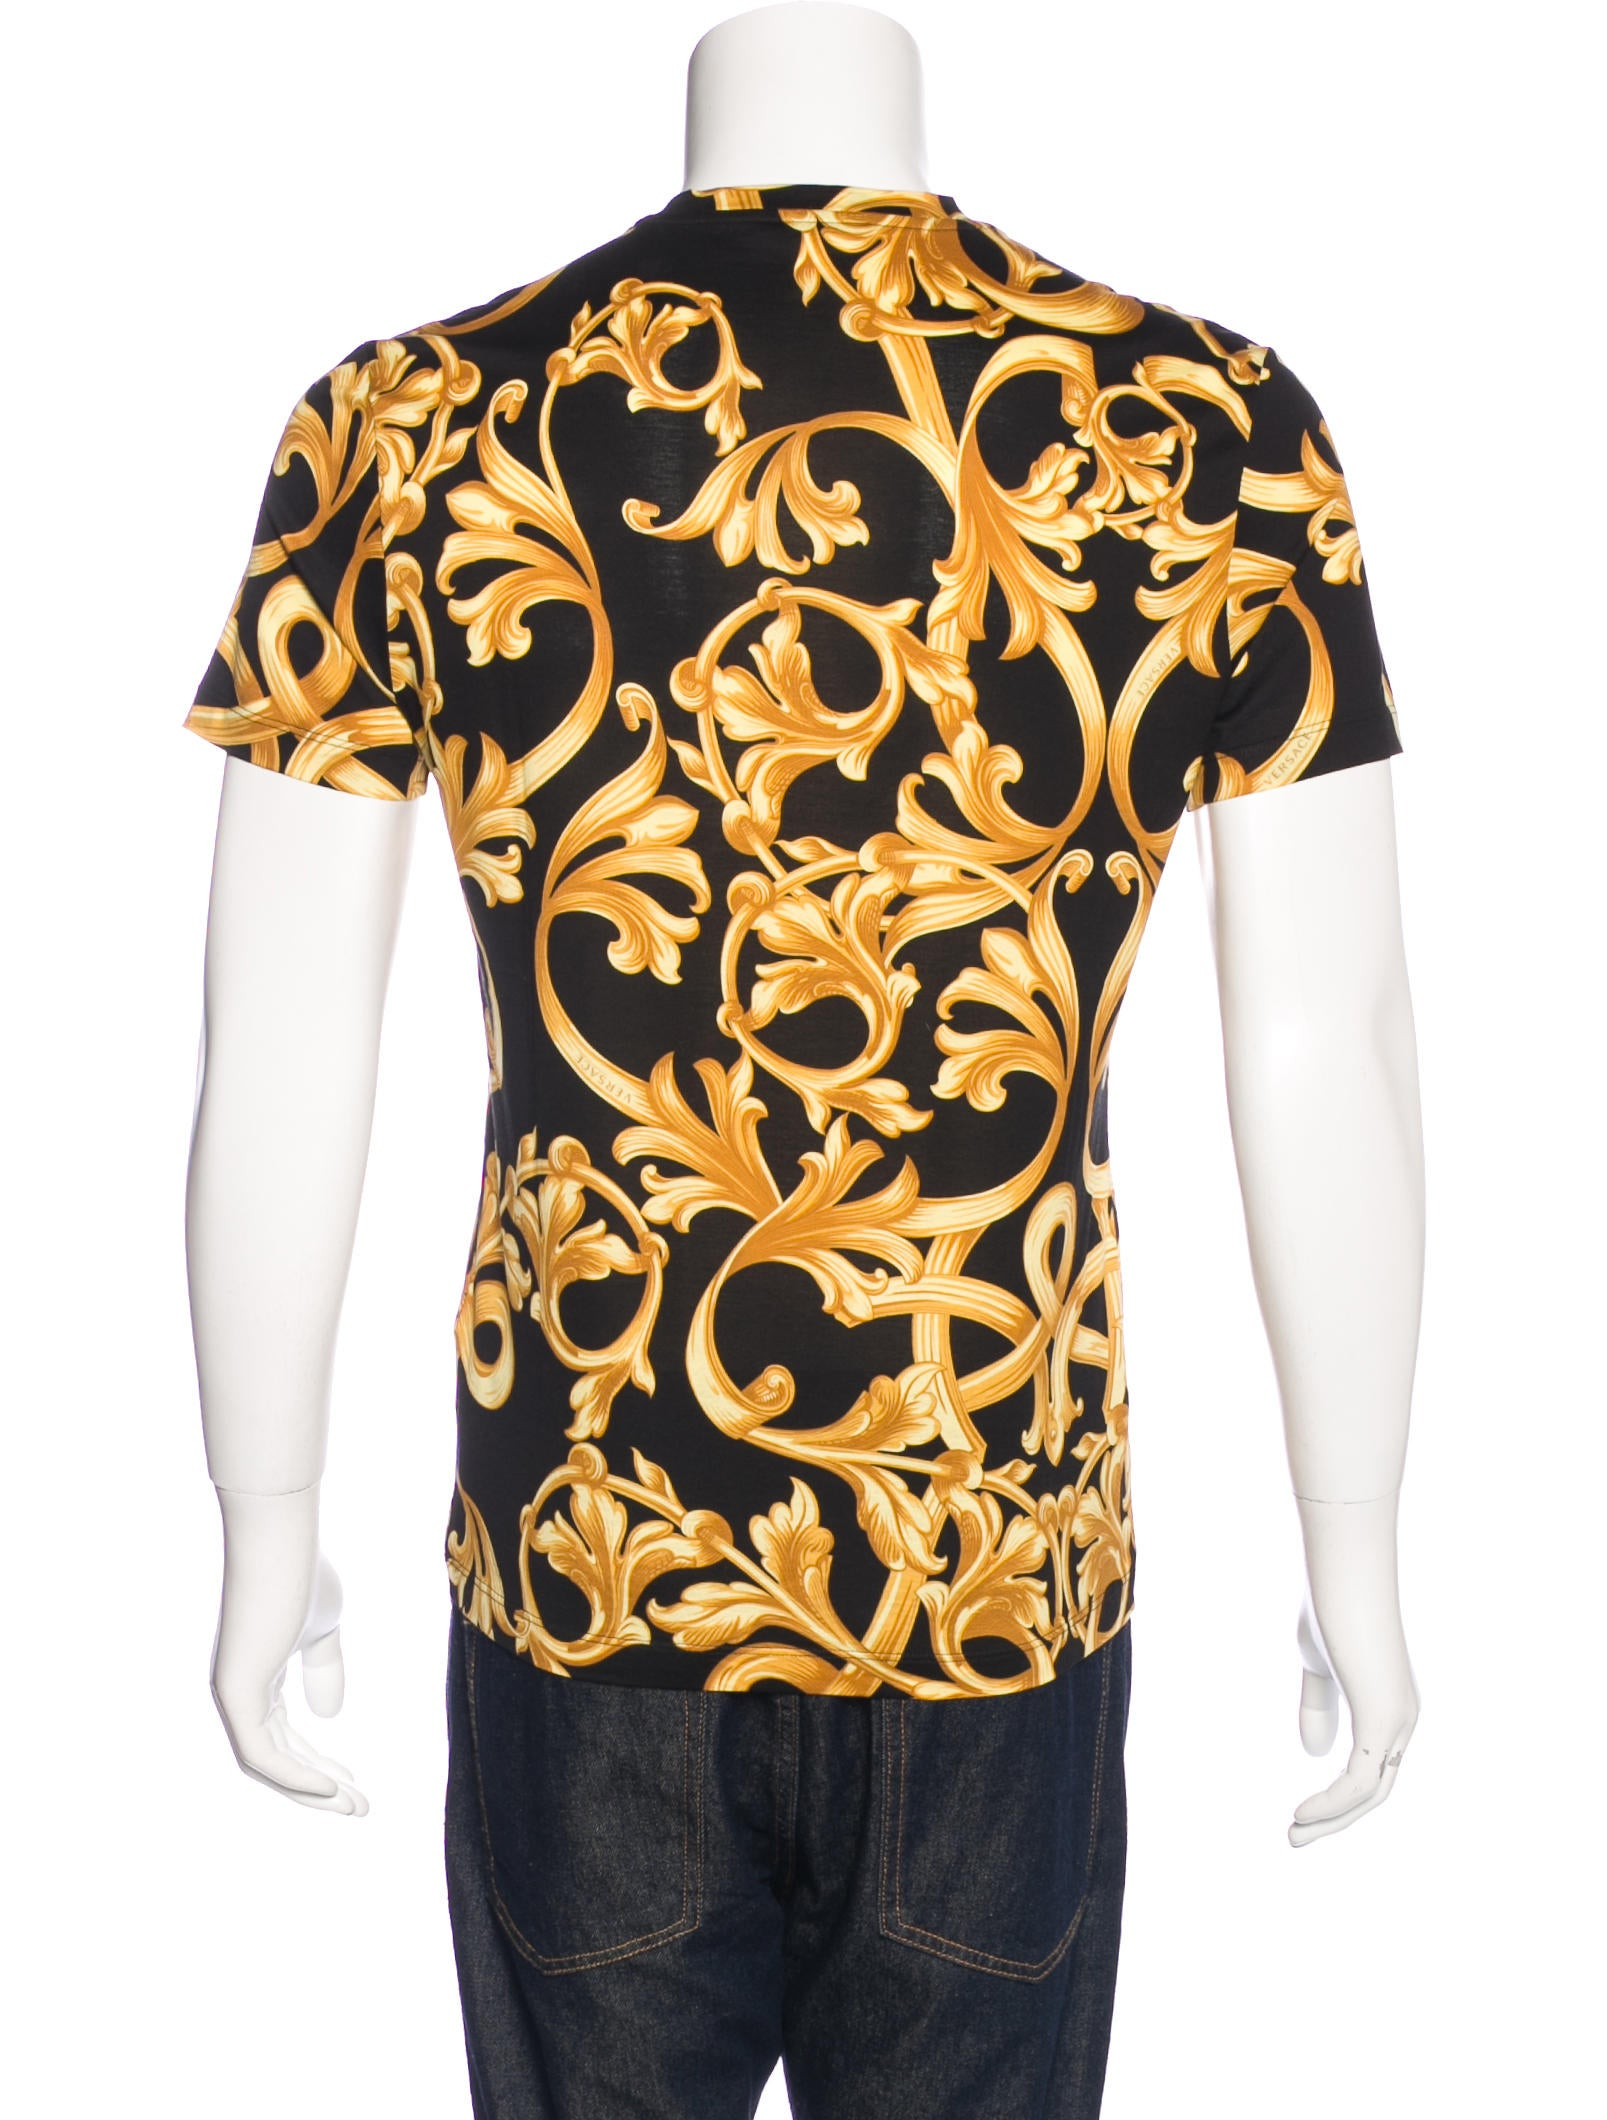 Versace Barocco Print T-Shirt - Clothing - VES30796 | The ...